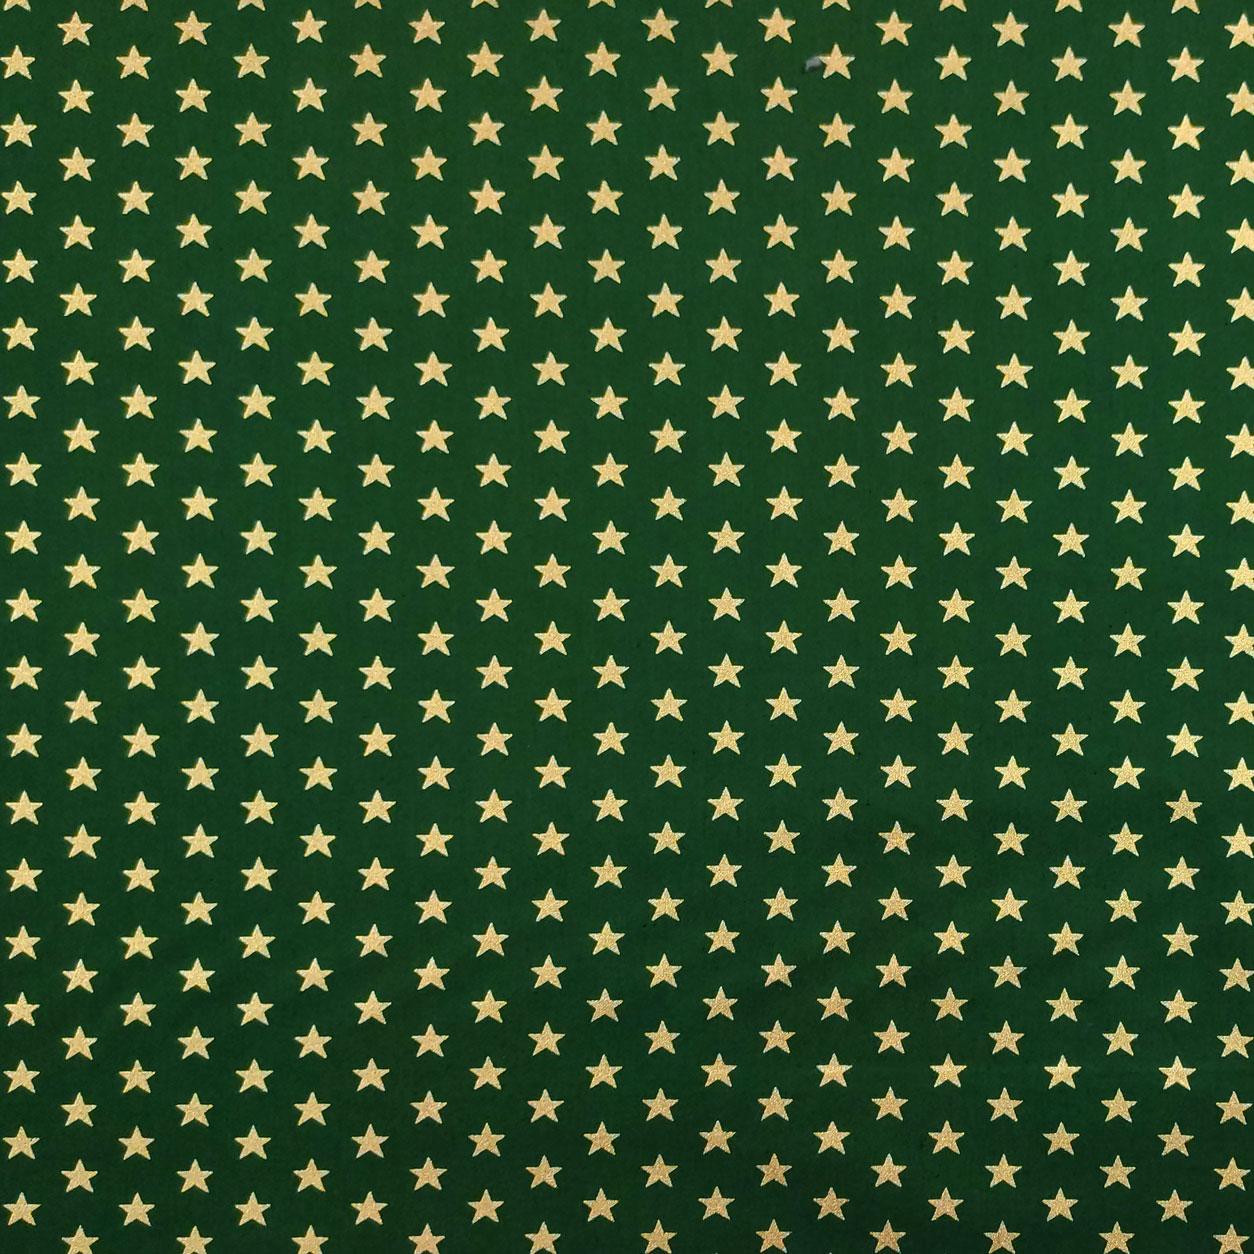 Tessuto Cotone Stelle Lurex Oro Sfondo Verde